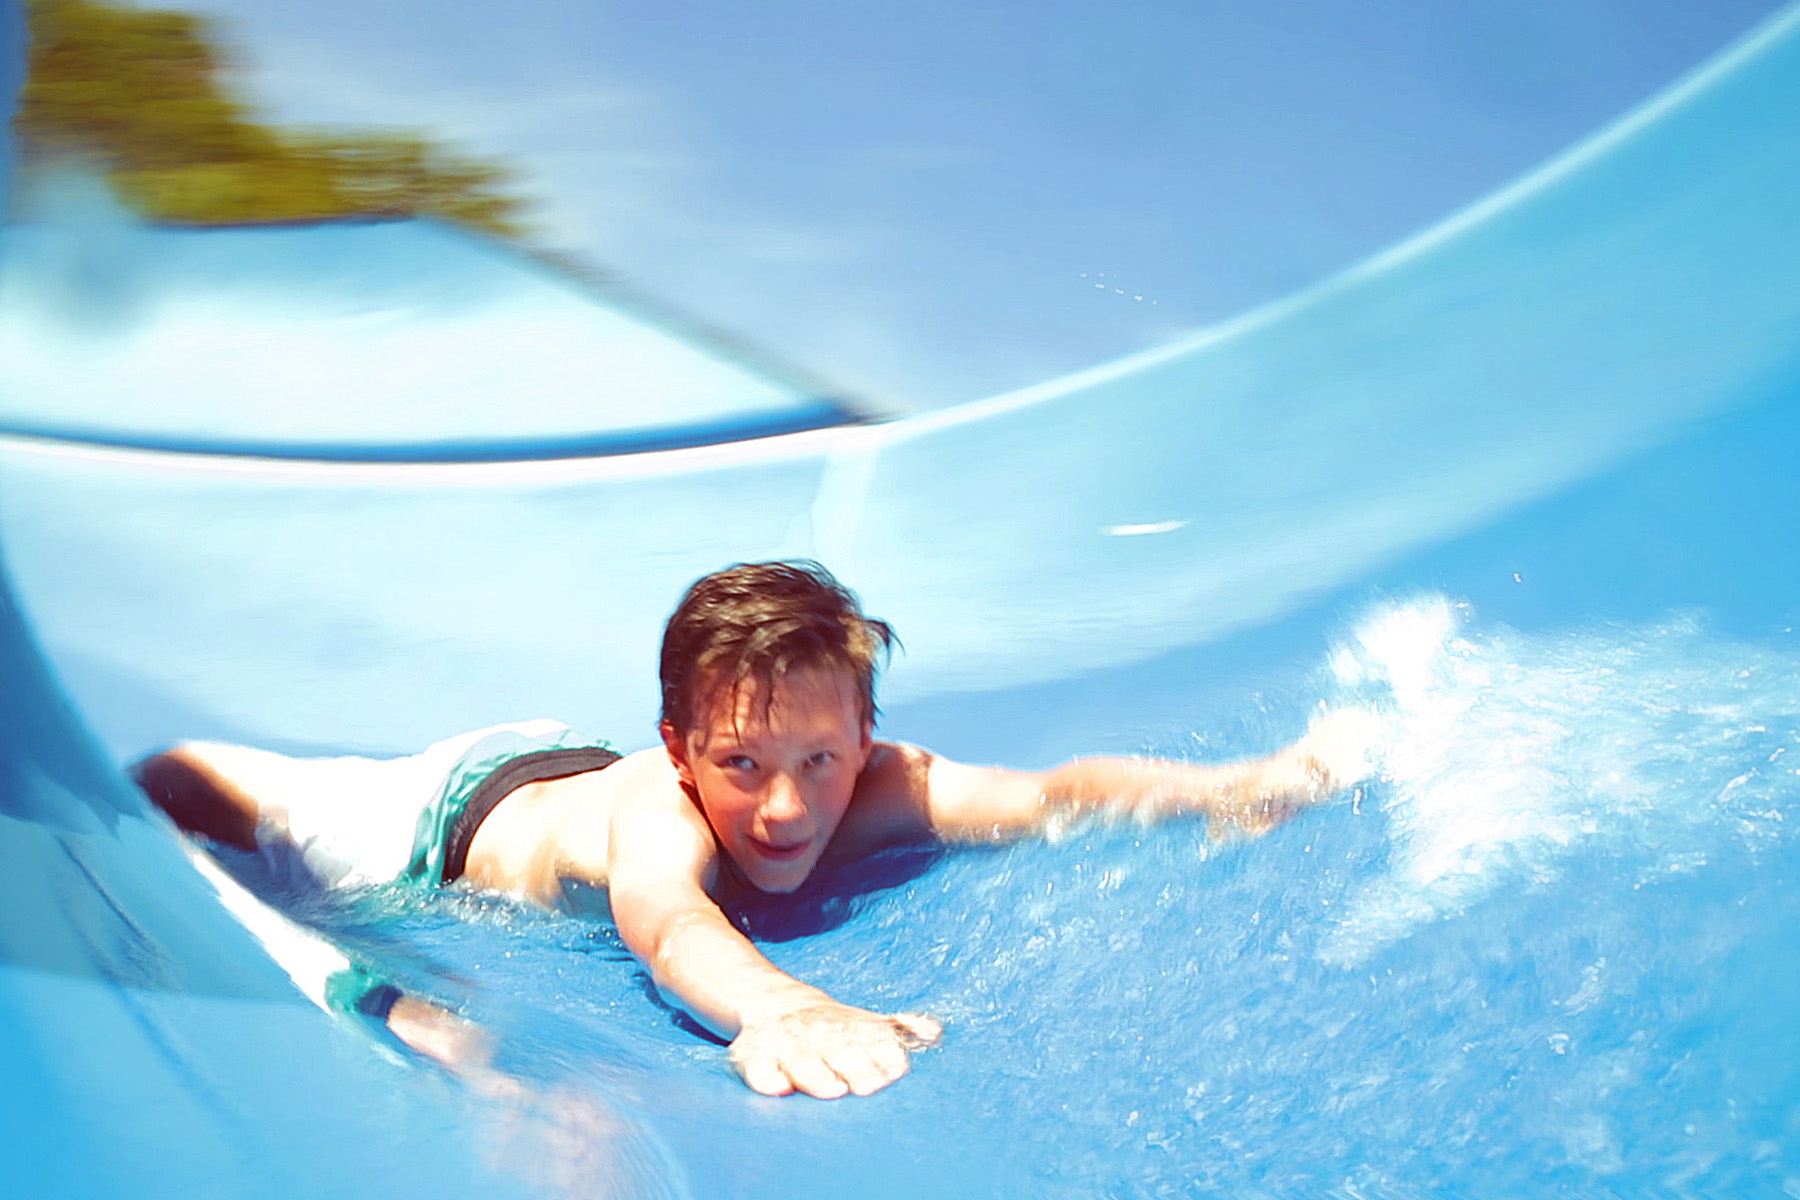 Junge rutscht im Badepark